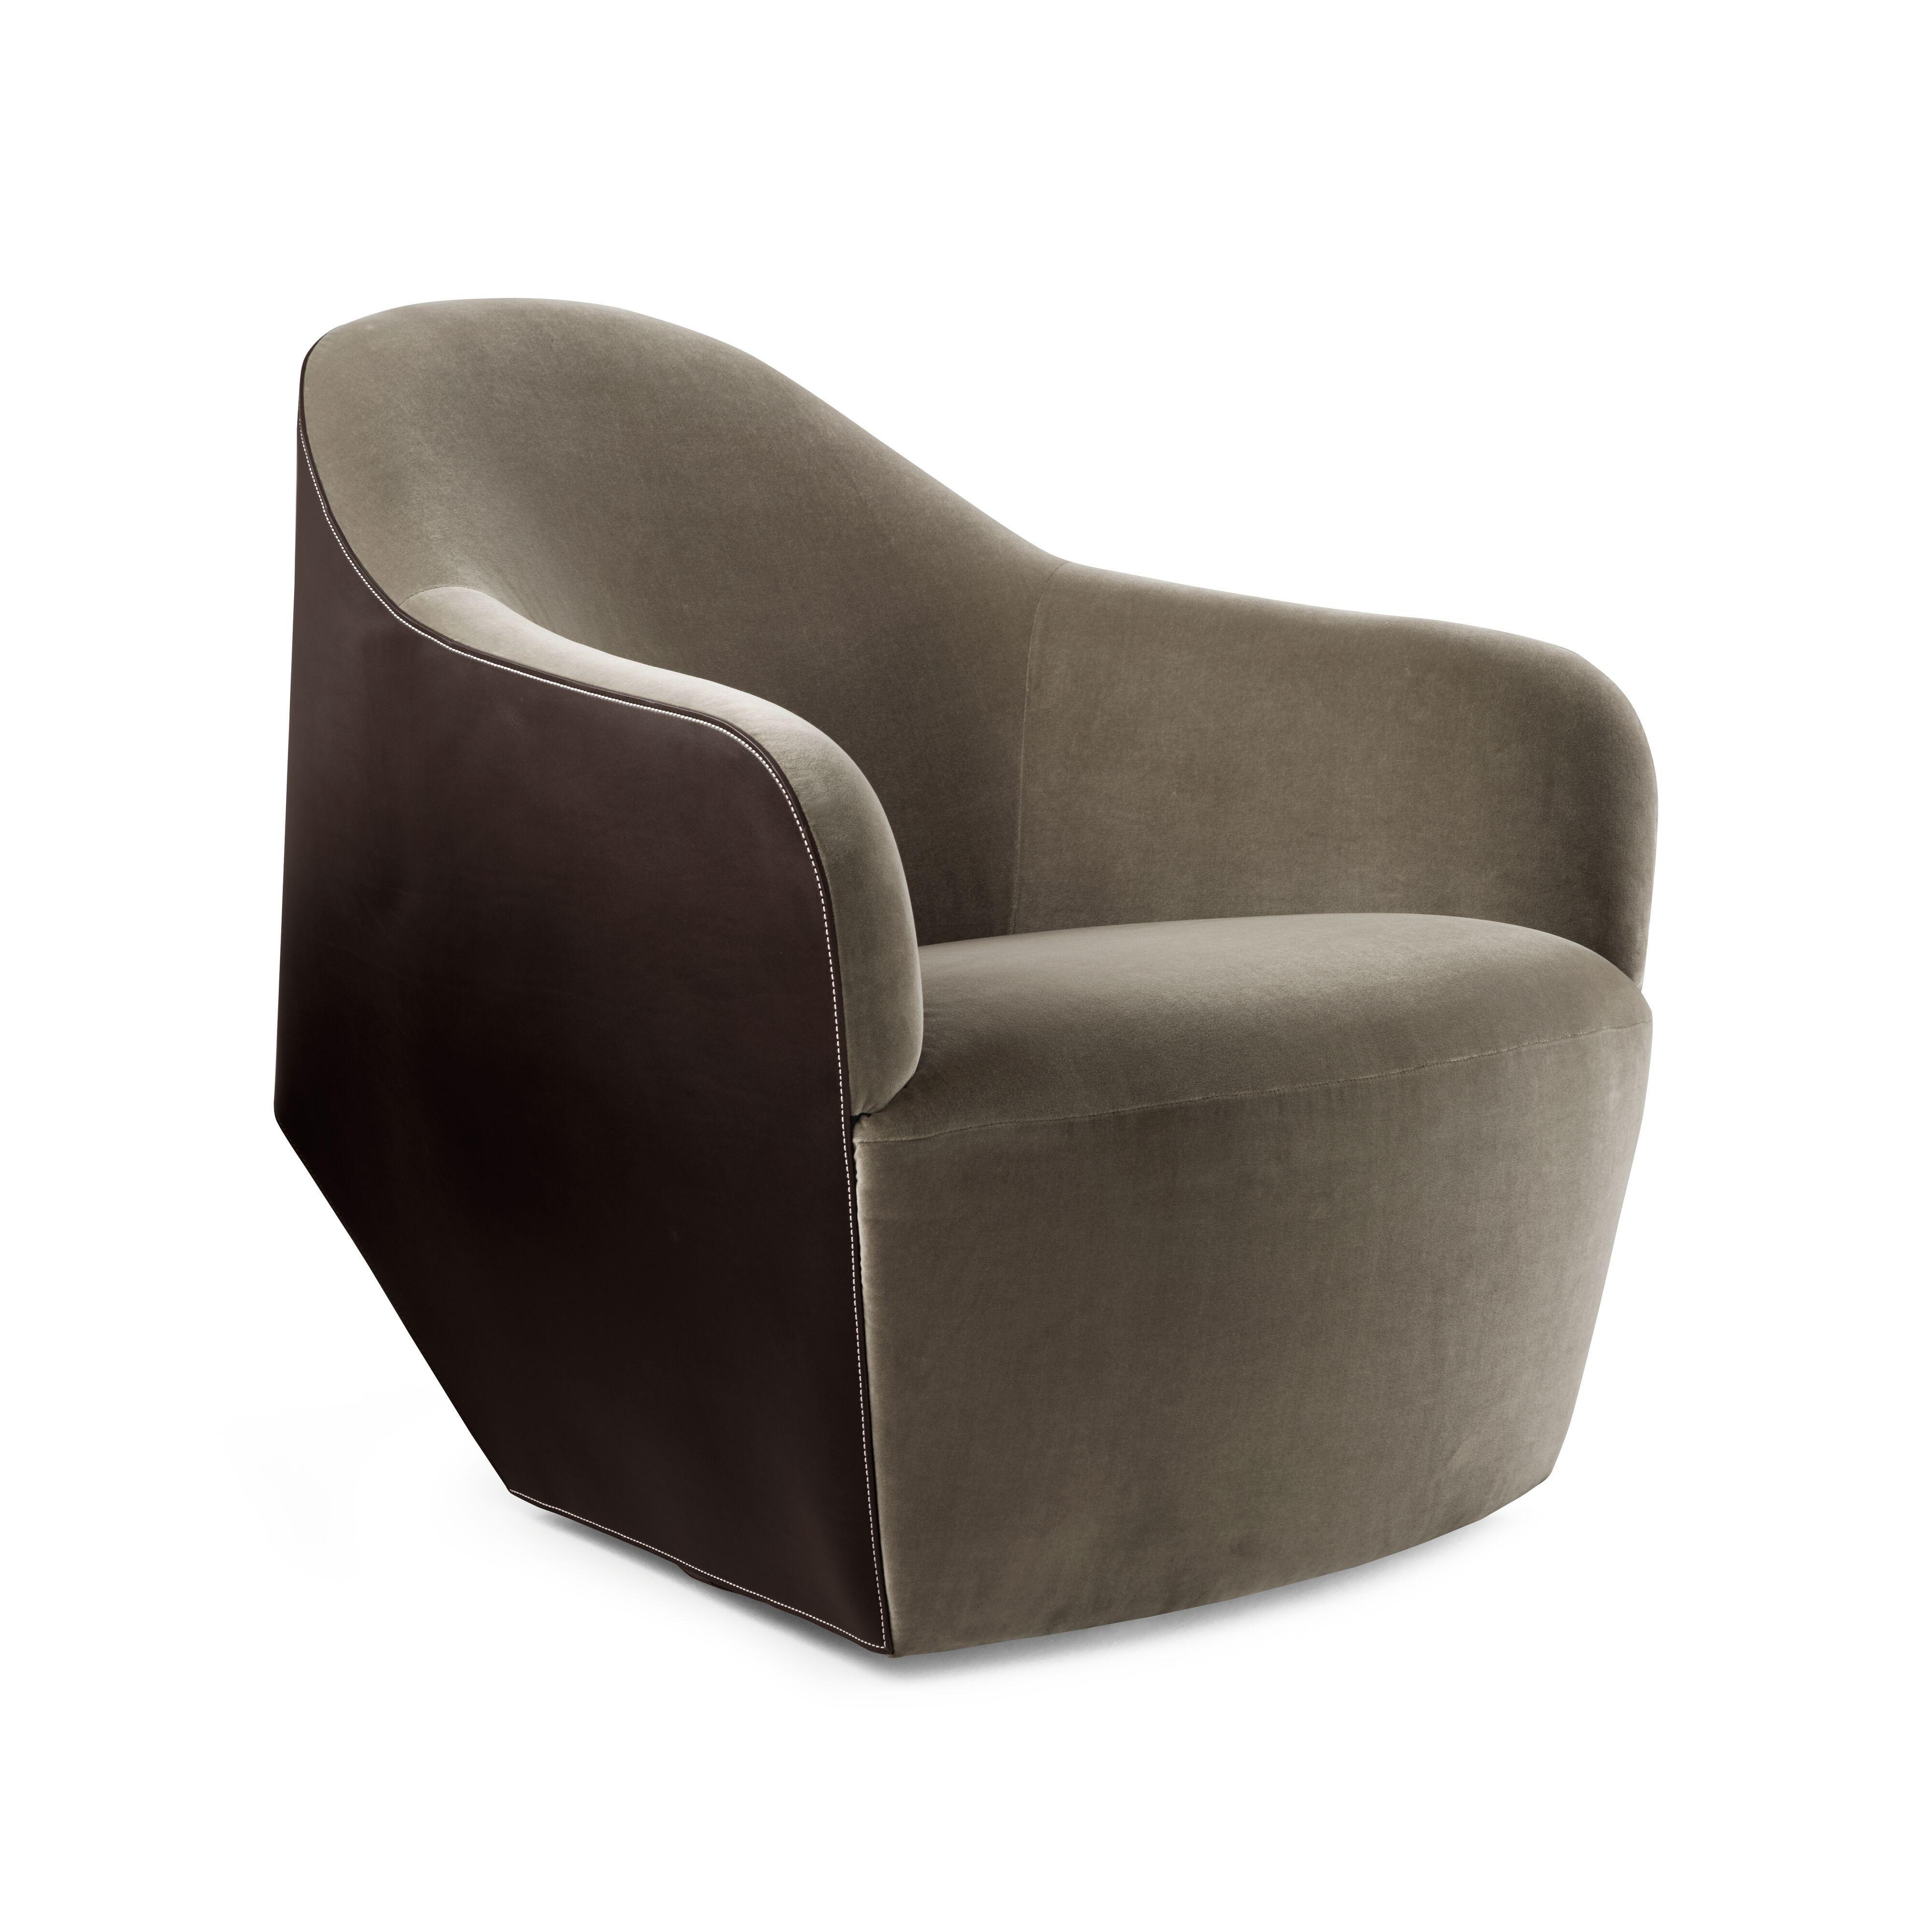 04-WK-Isanka-Chair-0005-H.tif